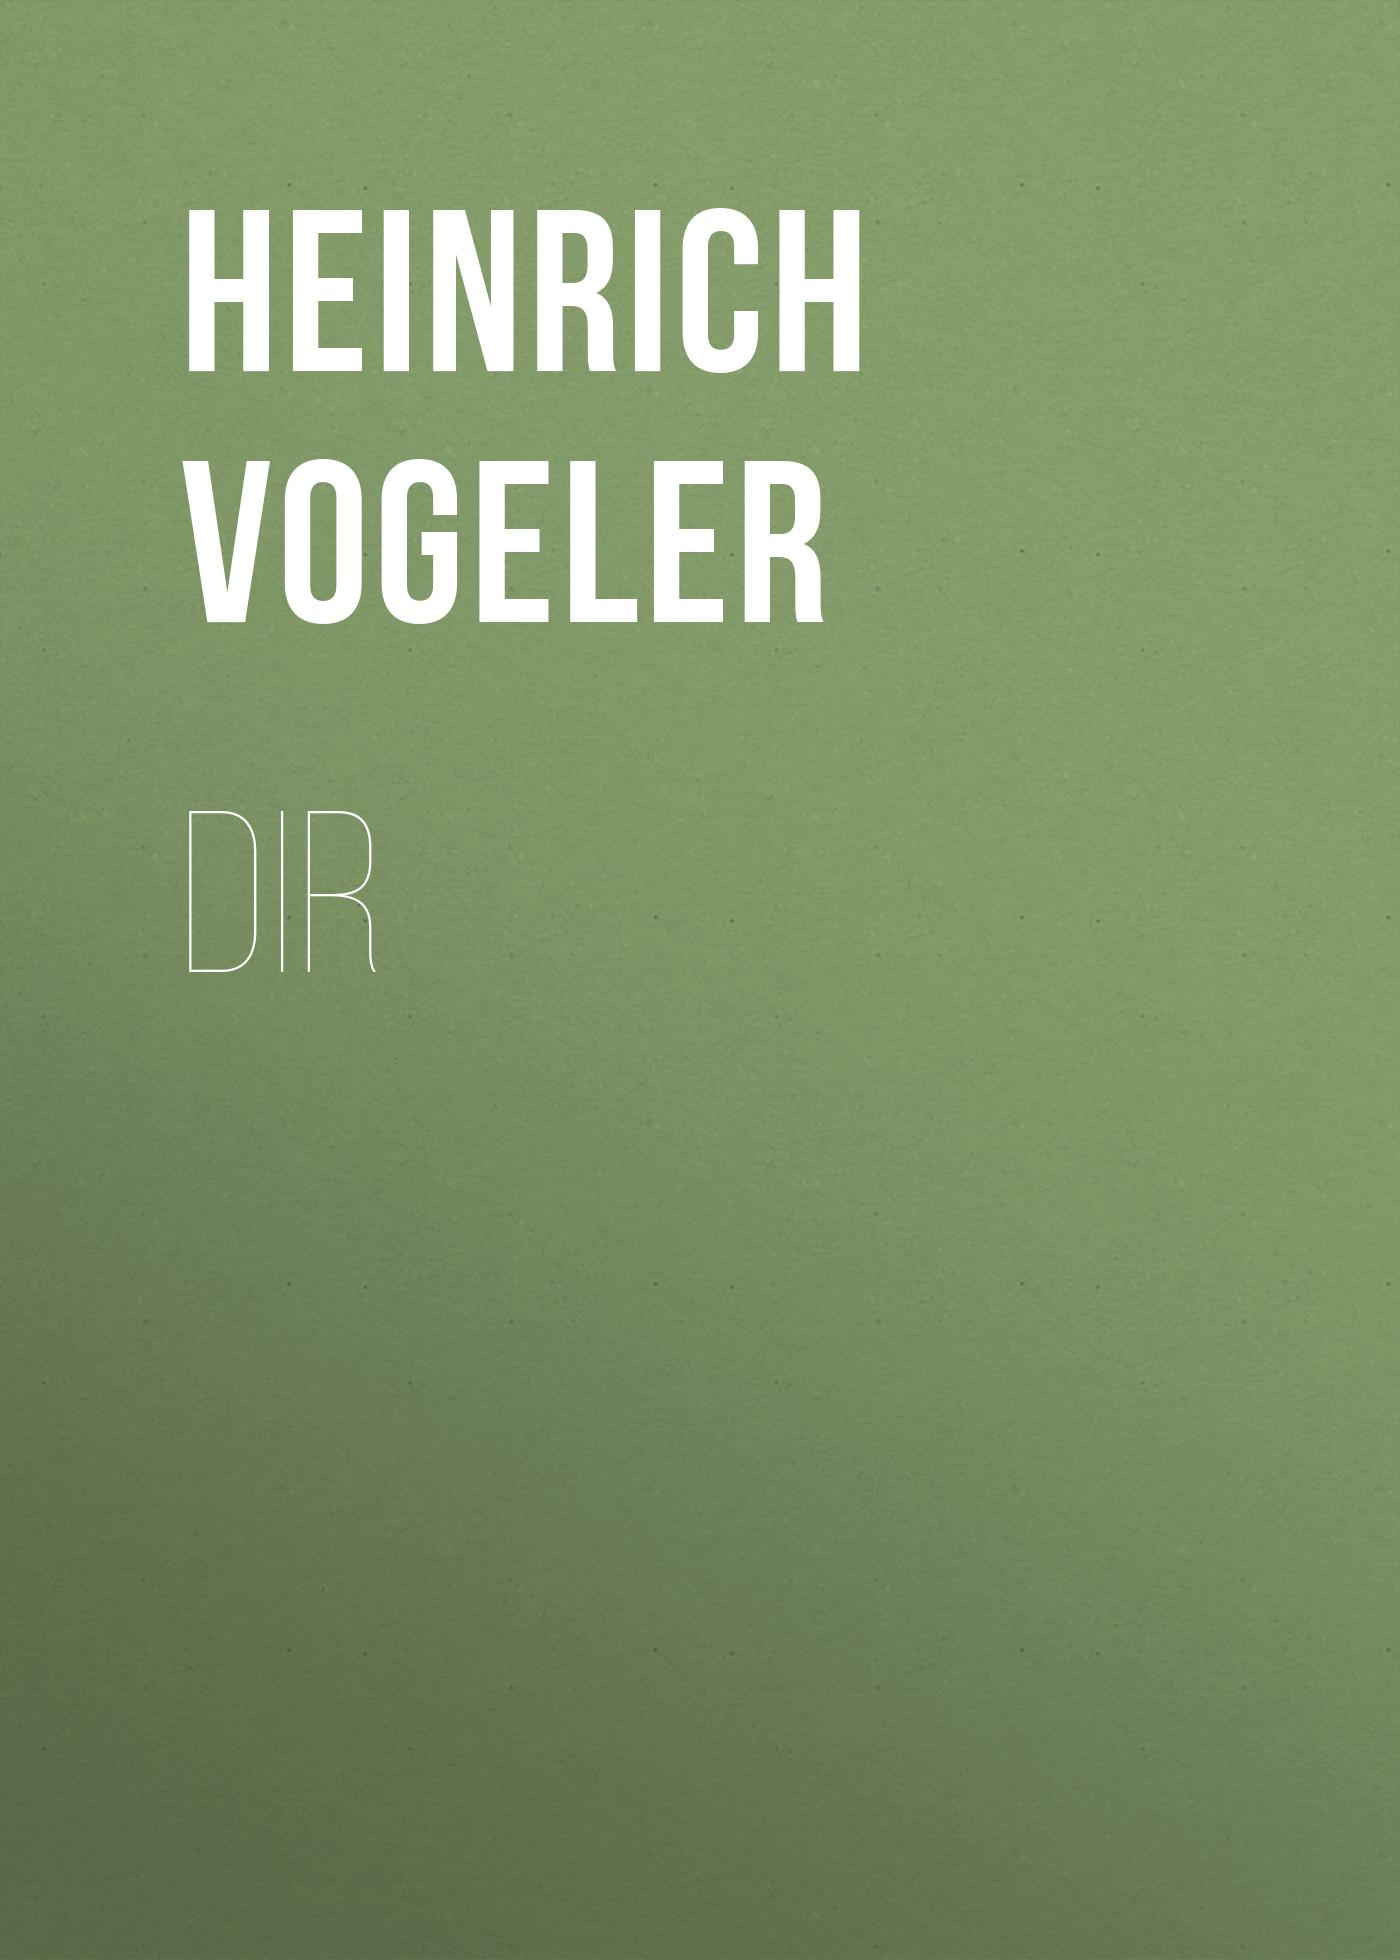 Heinrich Vogeler DIR